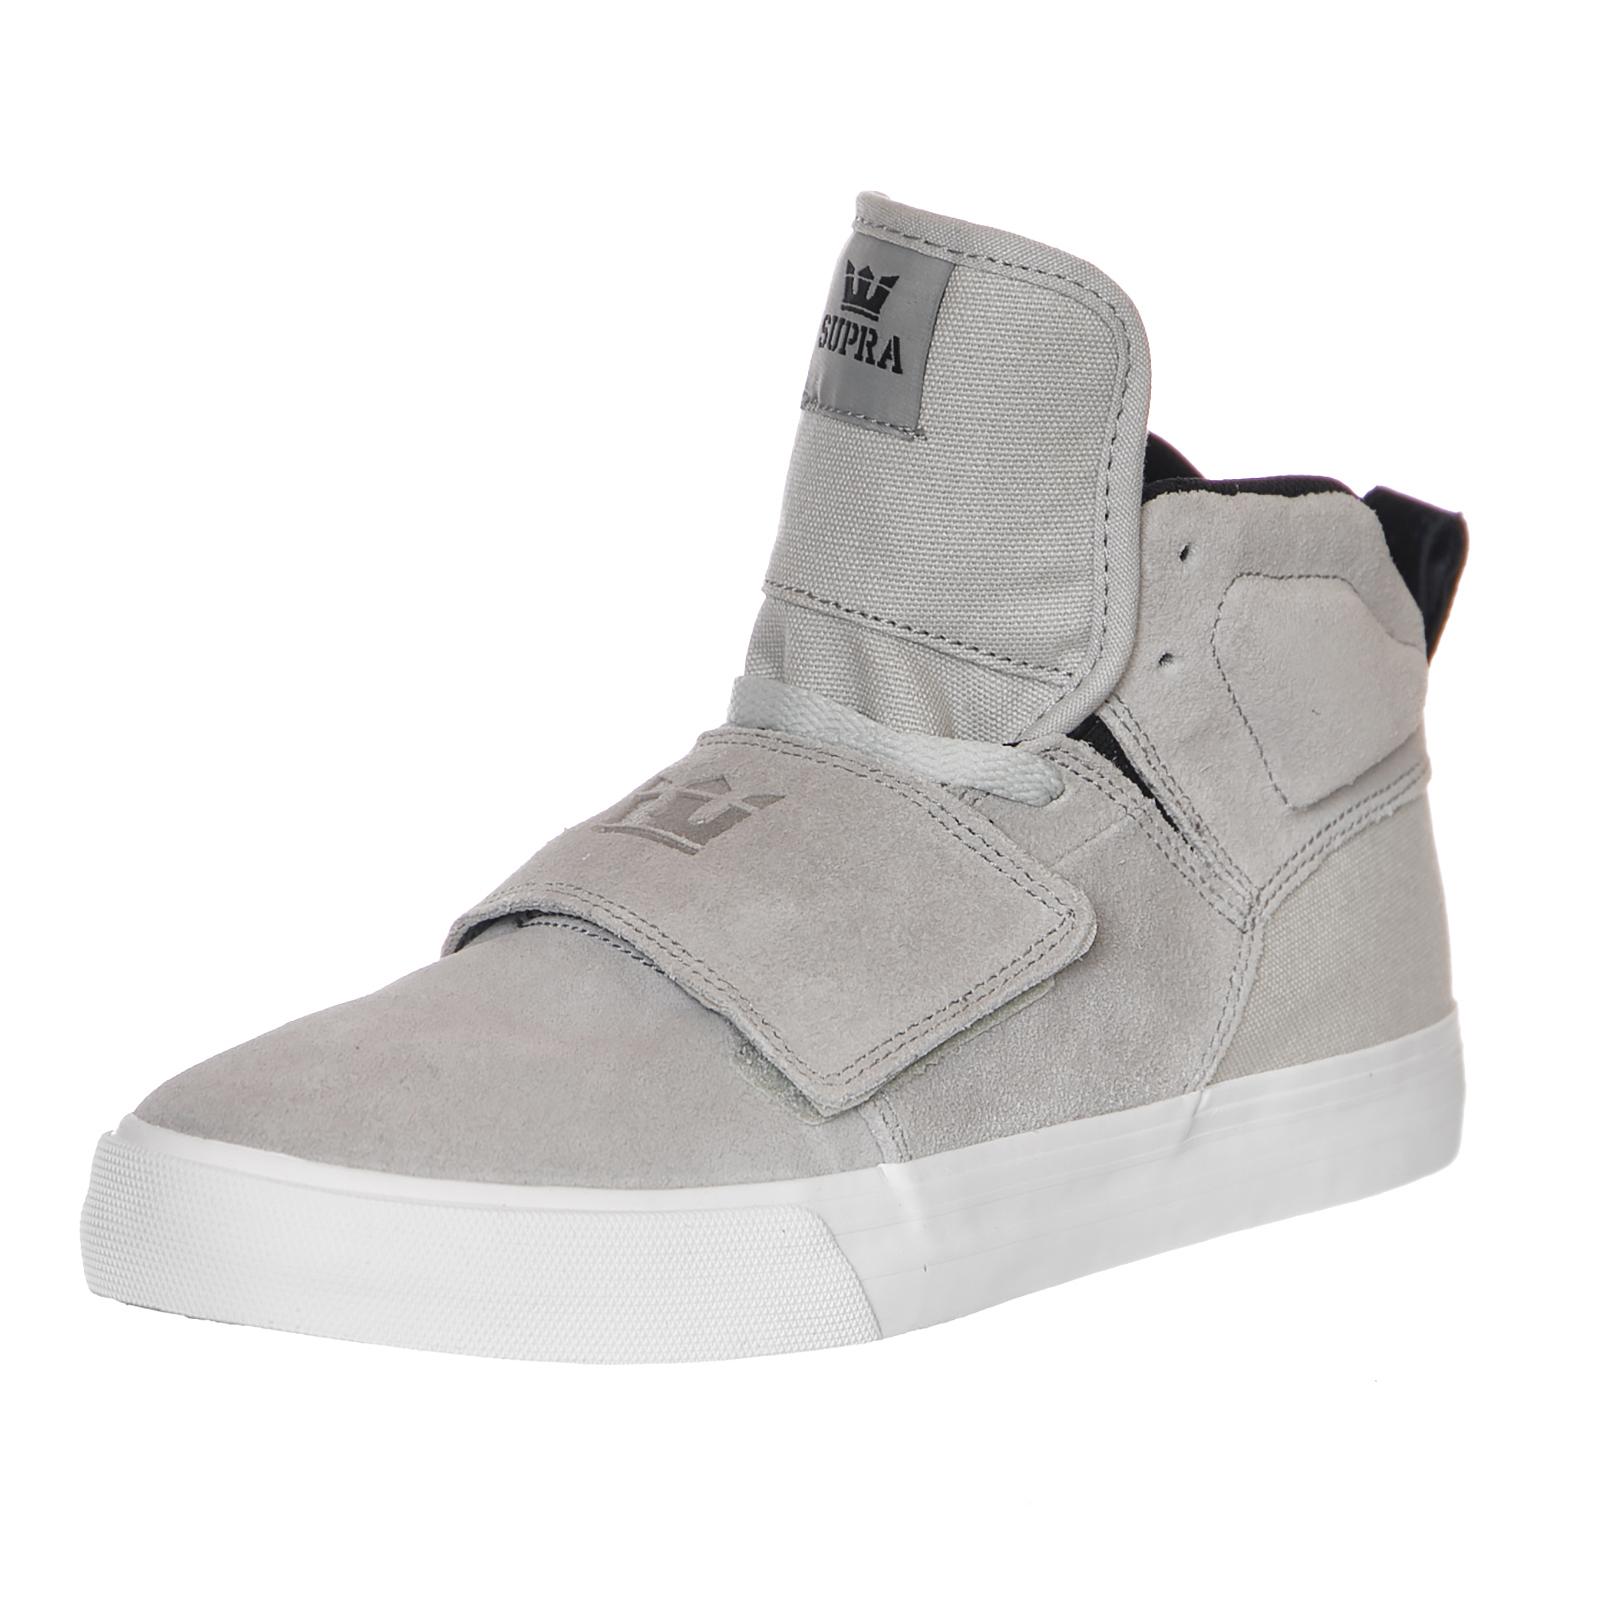 Supra Sneakers Rock Lt. Grey-White Cornerstone grey